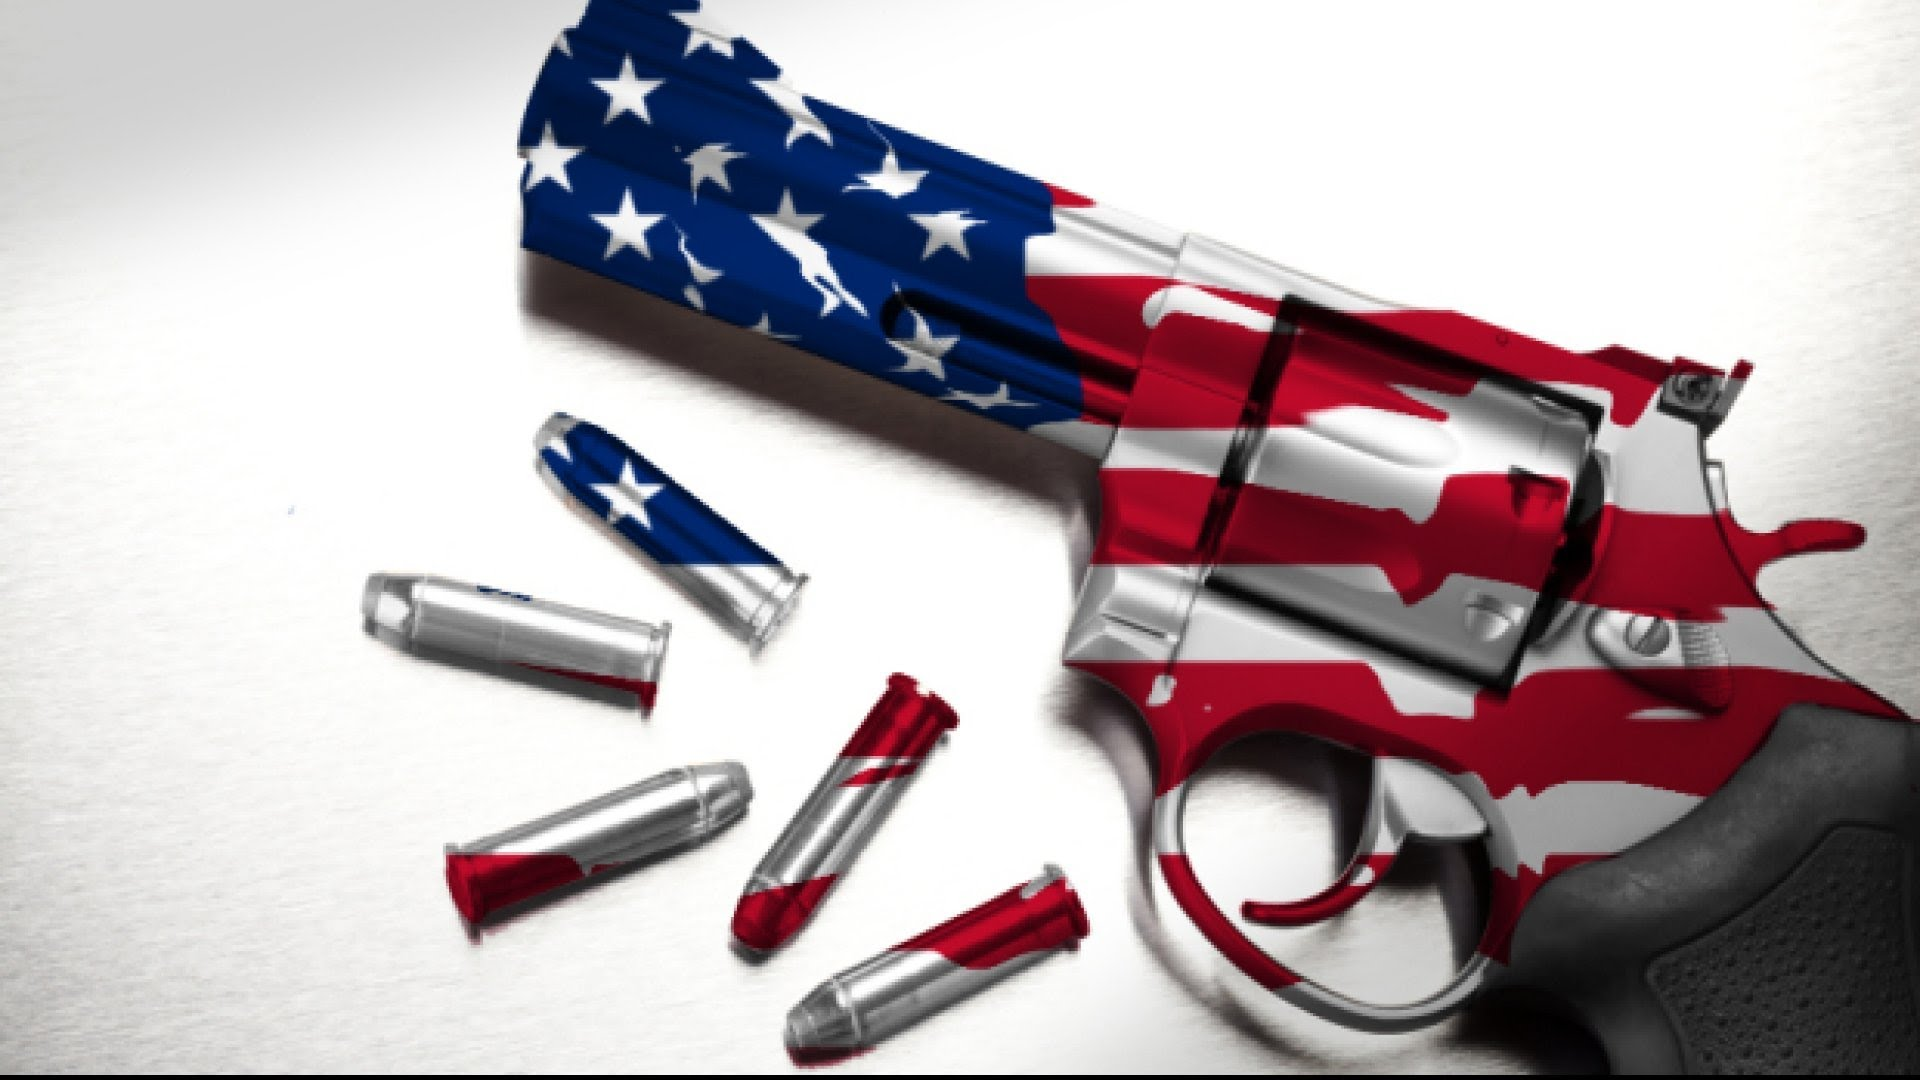 america and guns wallpaper - photo #2